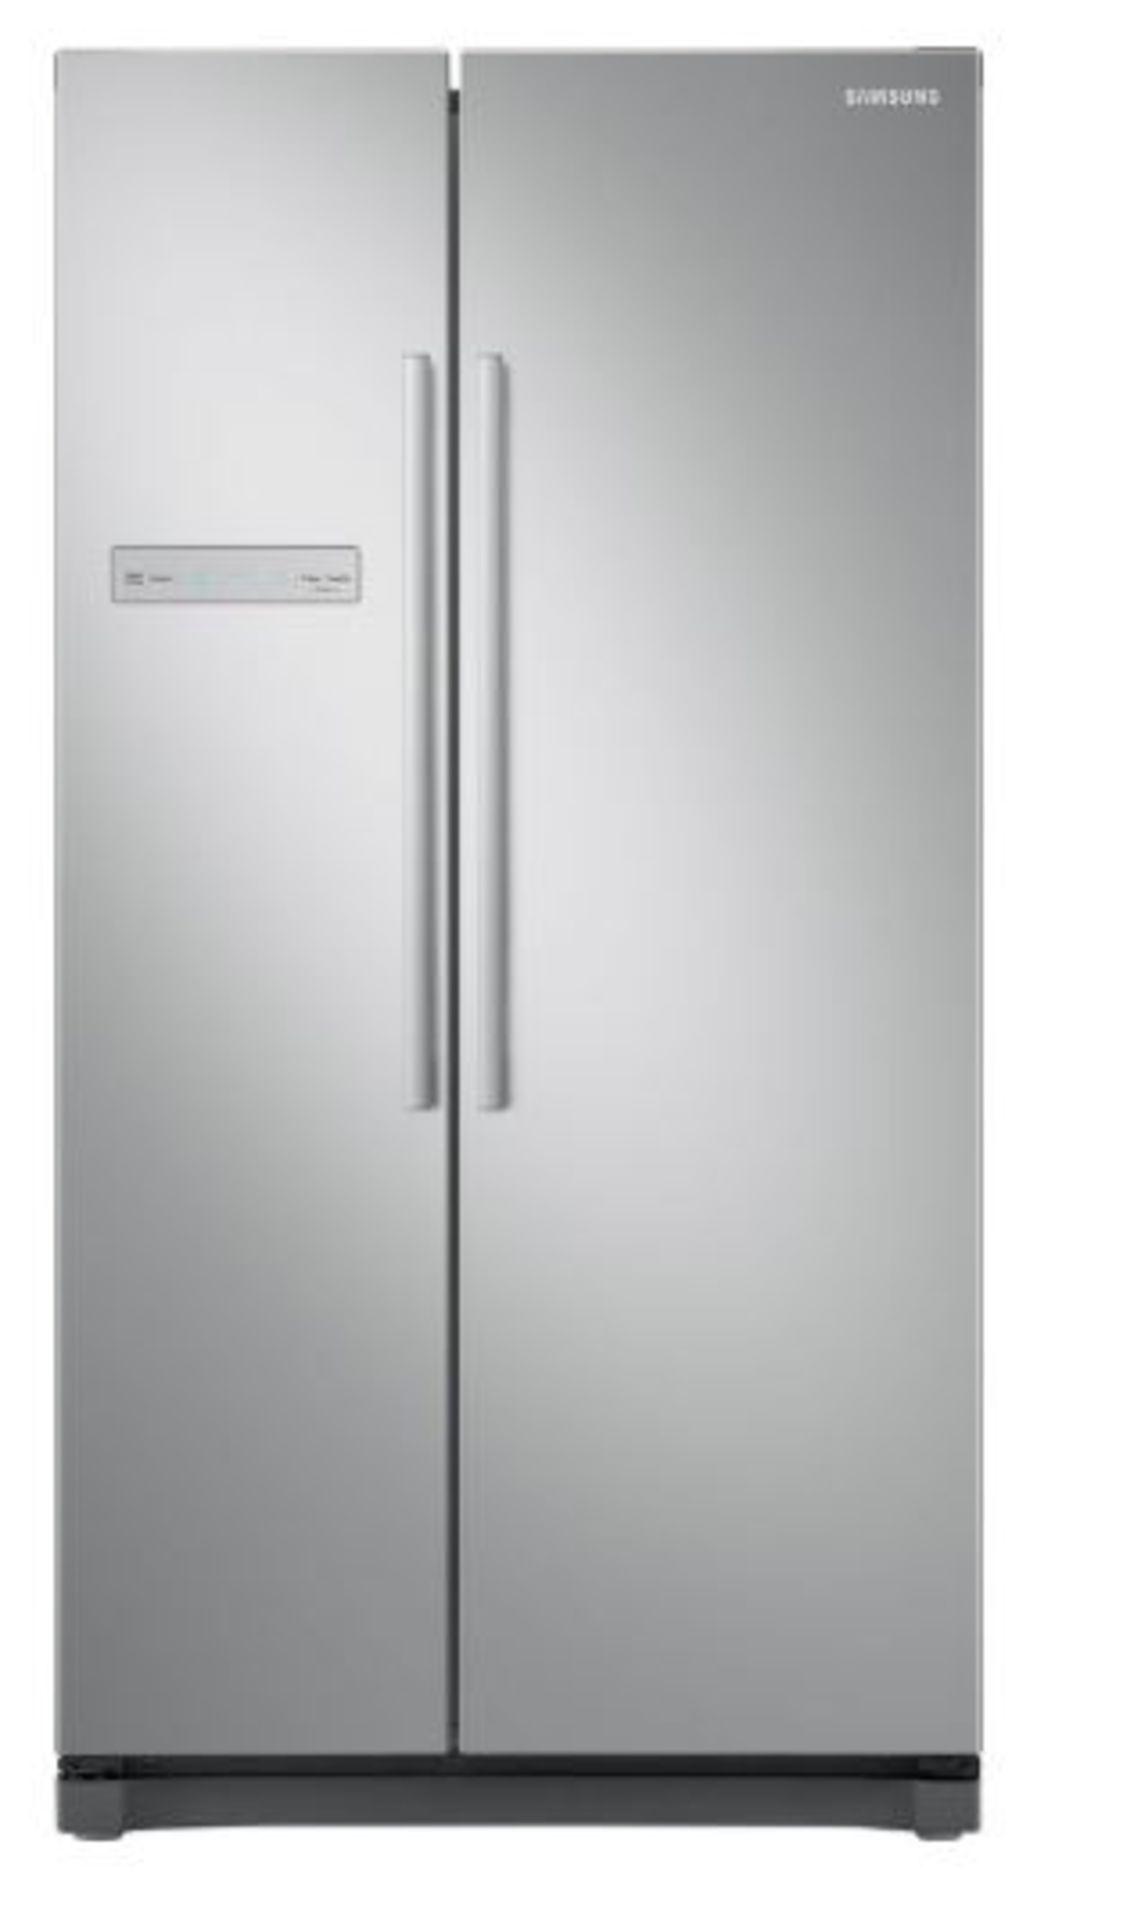 Pallet of 1 Samsung plain door Fridge freezer. Latest selling price £899.99